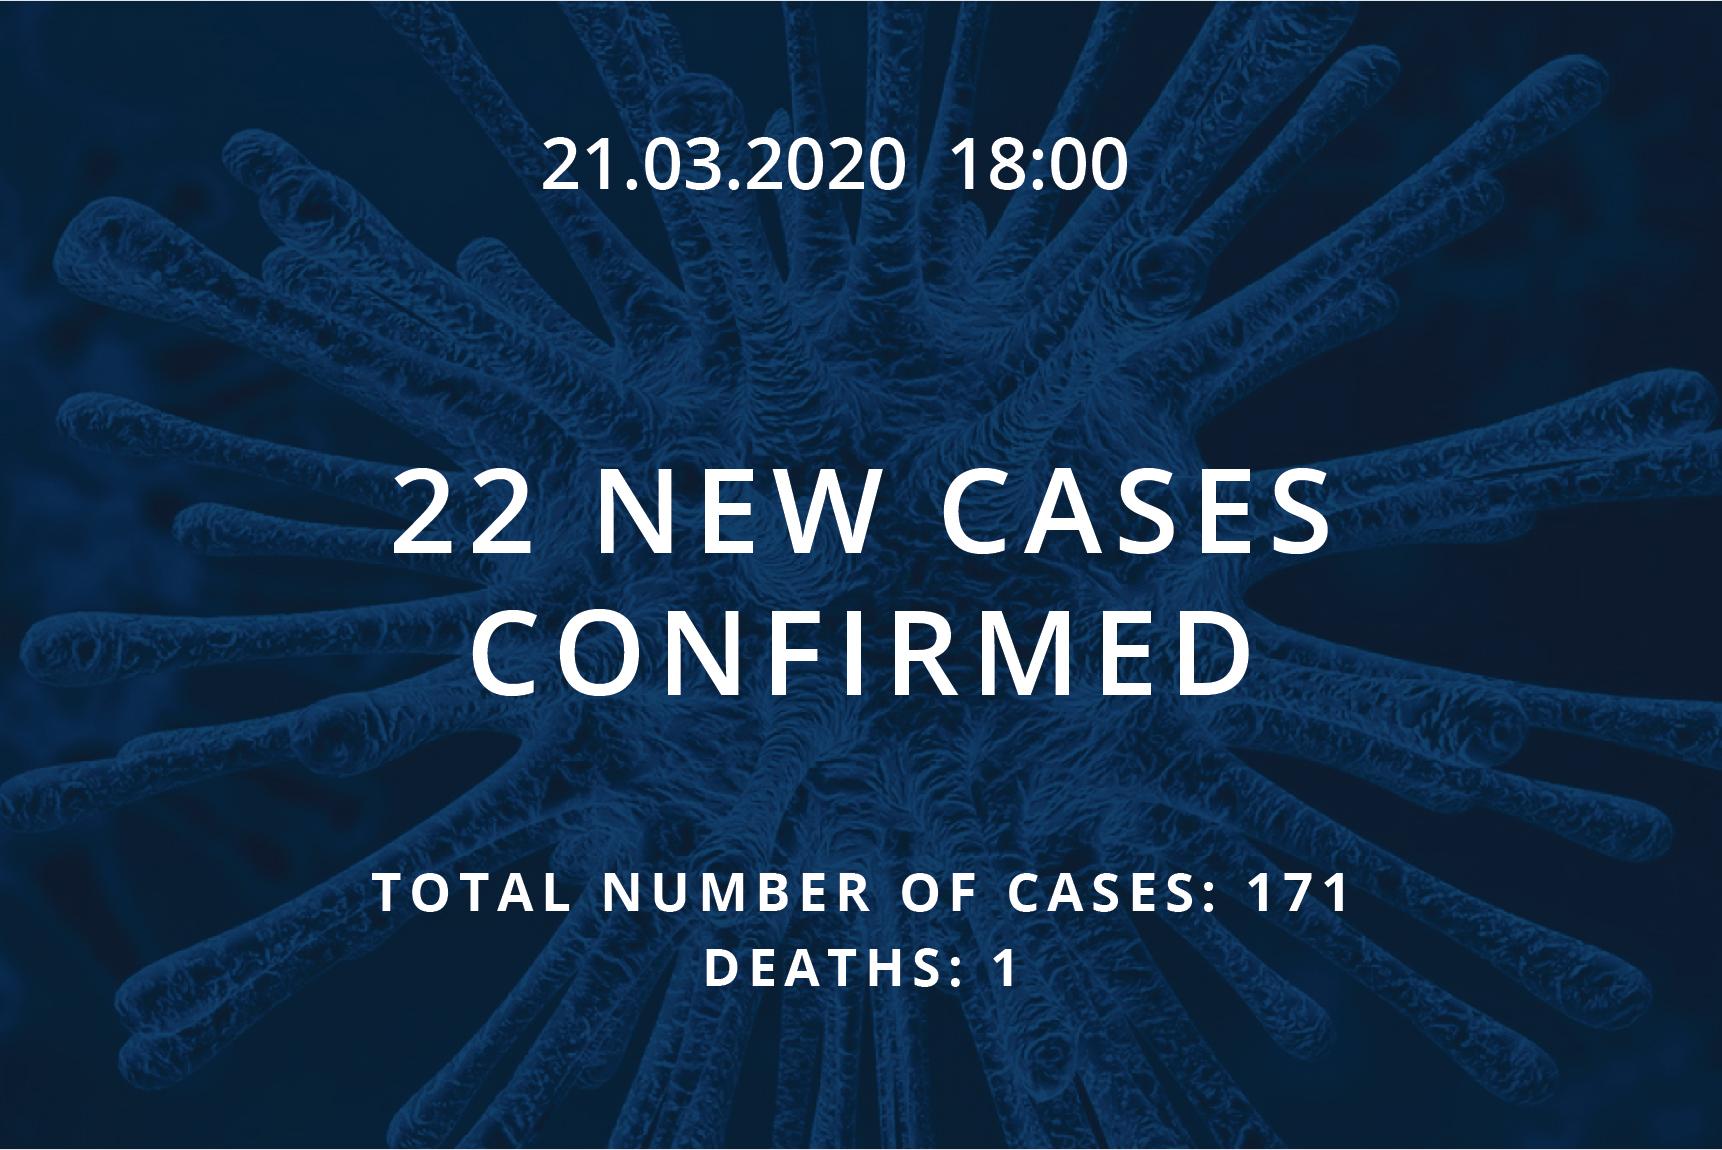 Information about coronavirus COVID-19, 21.03.2020 at 18:00